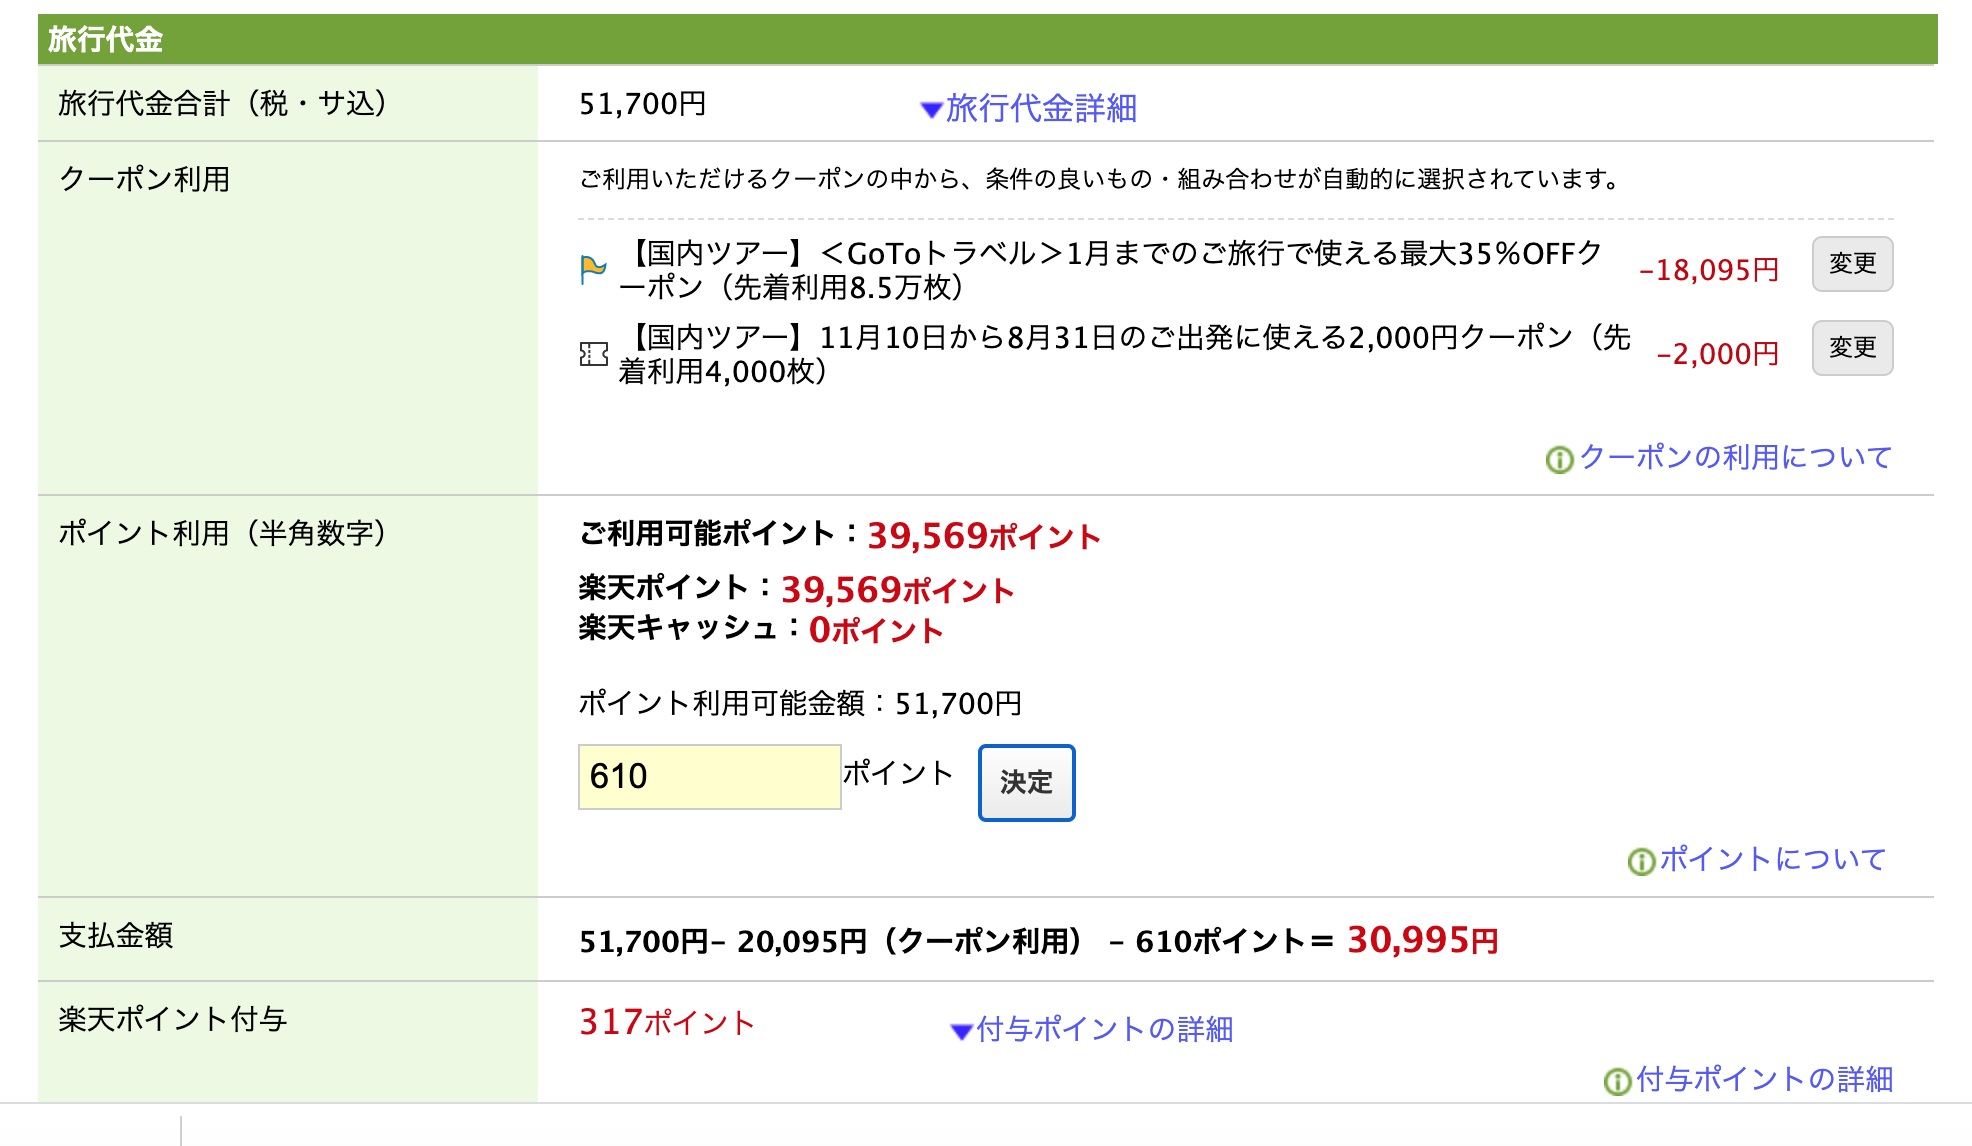 f:id:typekk:20201119020732p:plain